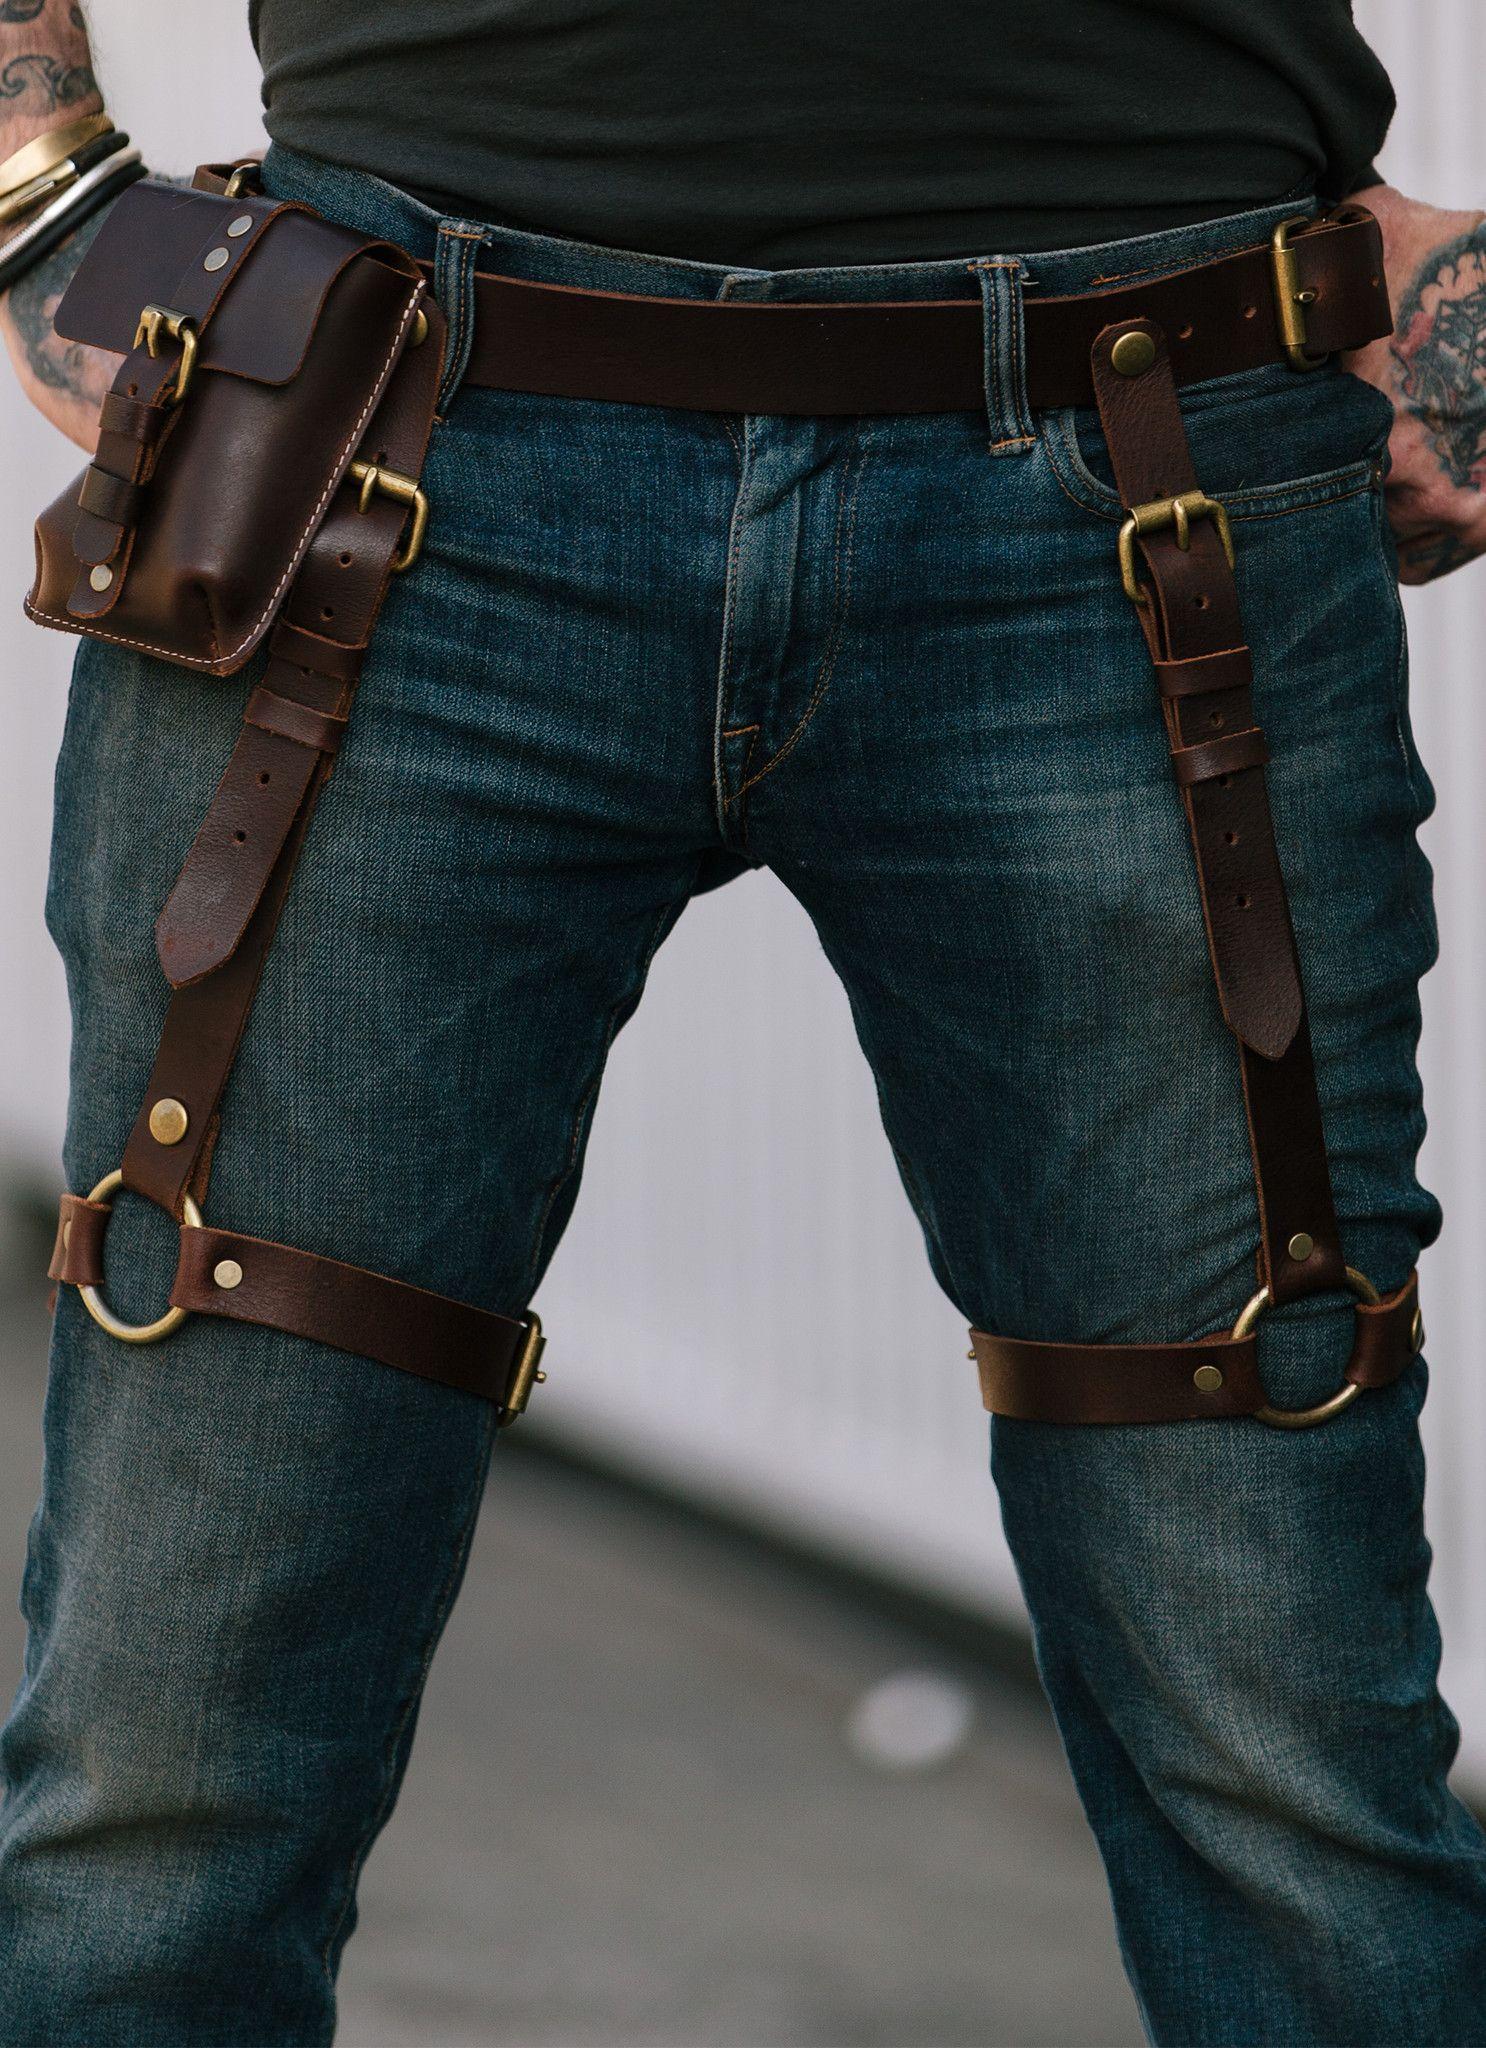 Men's Suspenders Fashion Elastic Adjustable Legs Belts Suspenders For Men Shirt Holders Suspenders Mens Clothes Accessories Complete Range Of Articles Apparel Accessories